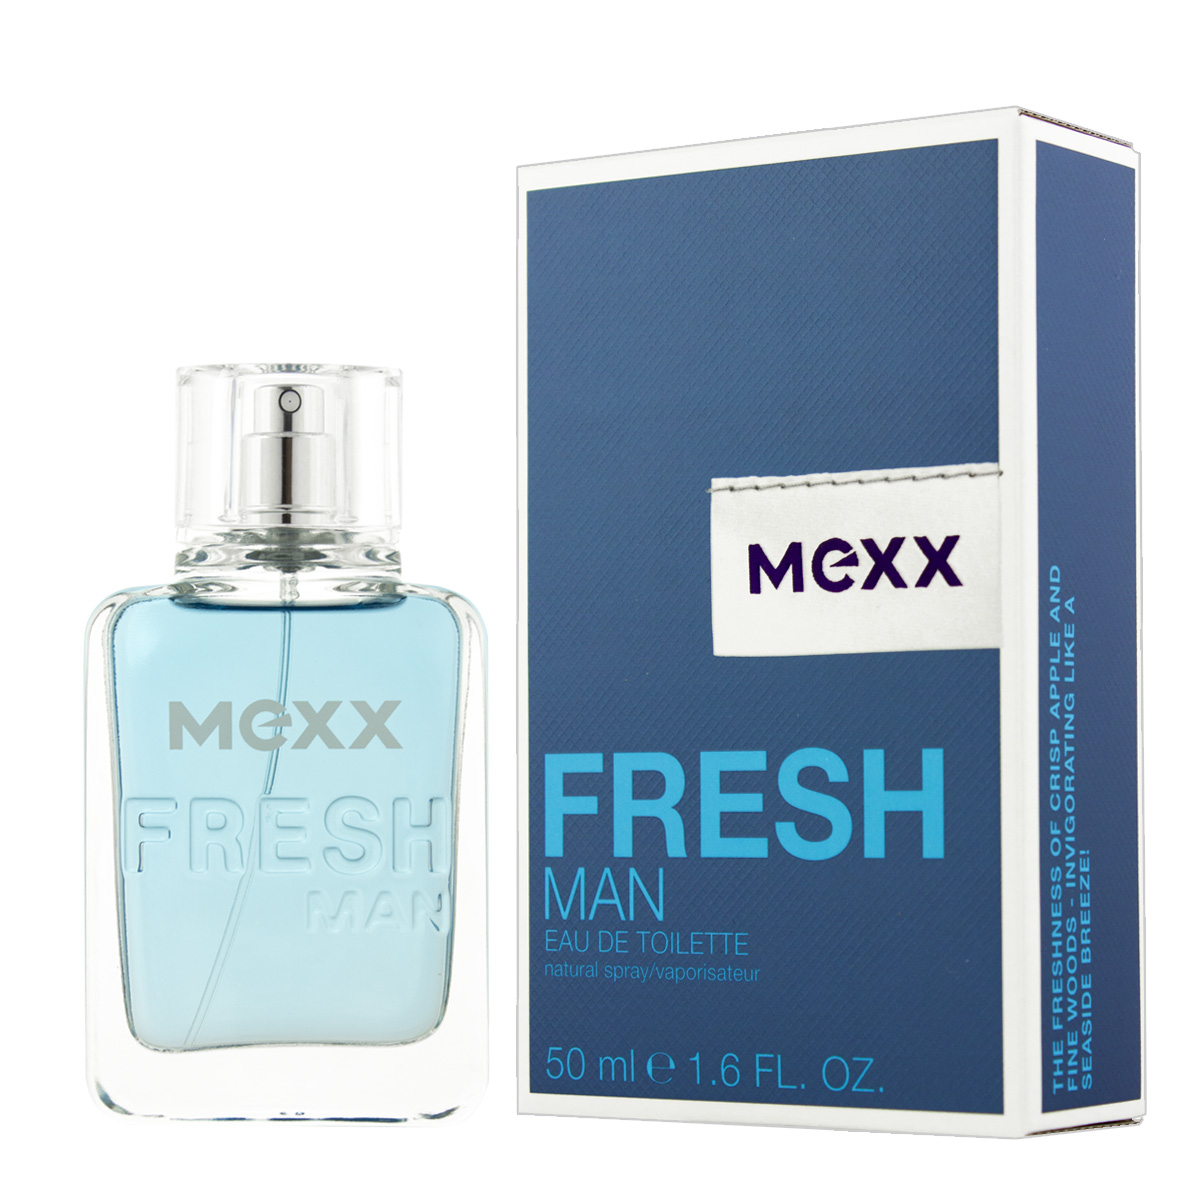 Mexx Fresh Man New Look Eau de Toilette 50 ml (man)